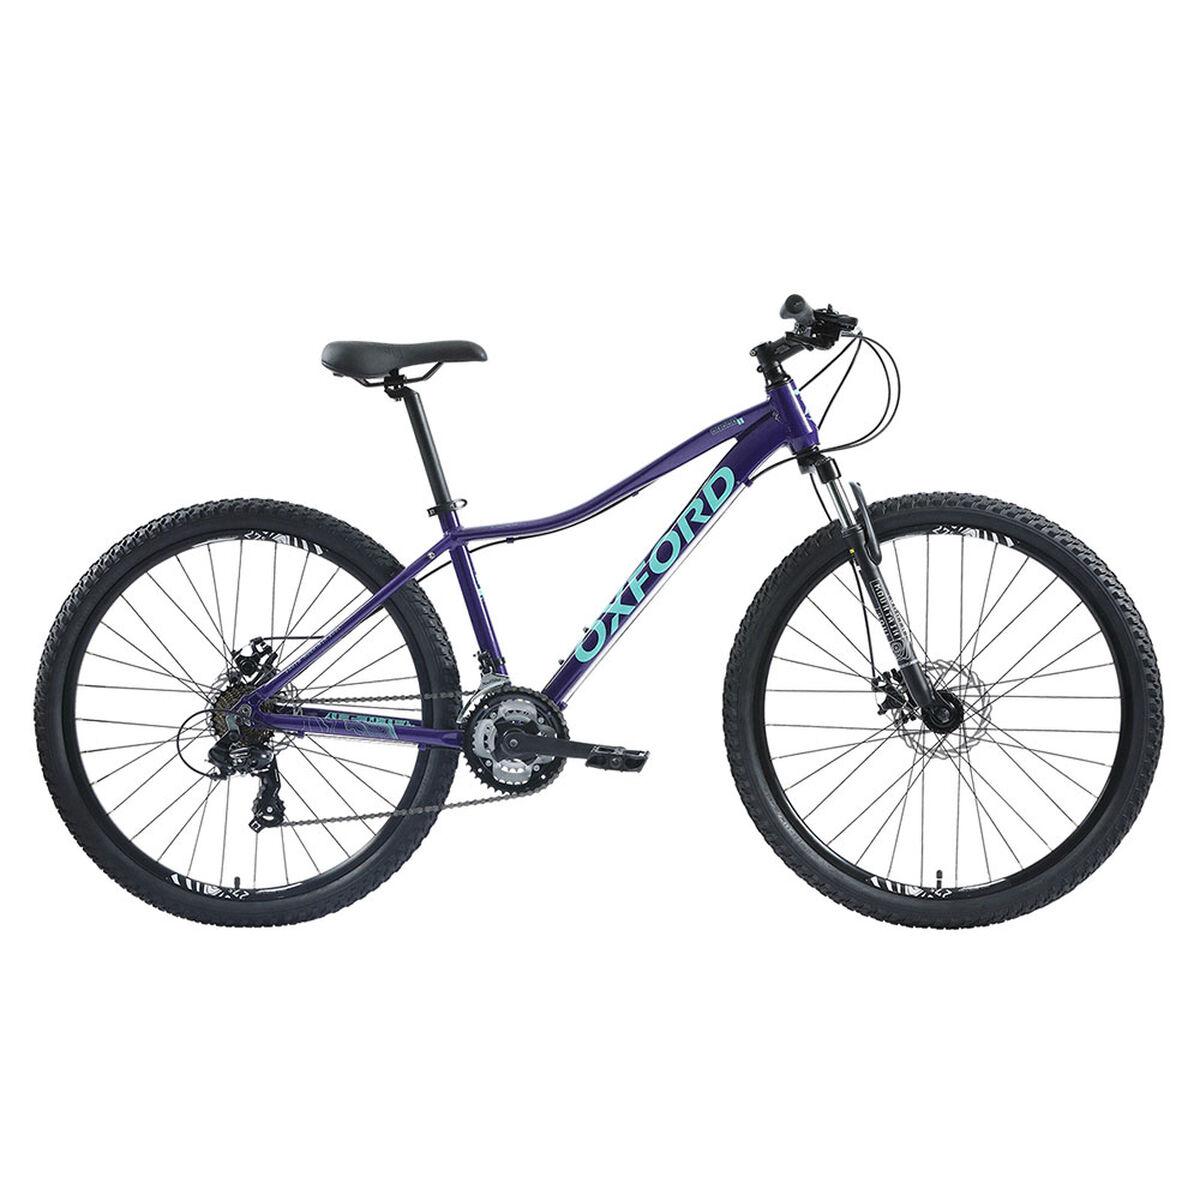 Bicicleta Mountain Bike Mujer Oxford Aro 27.5